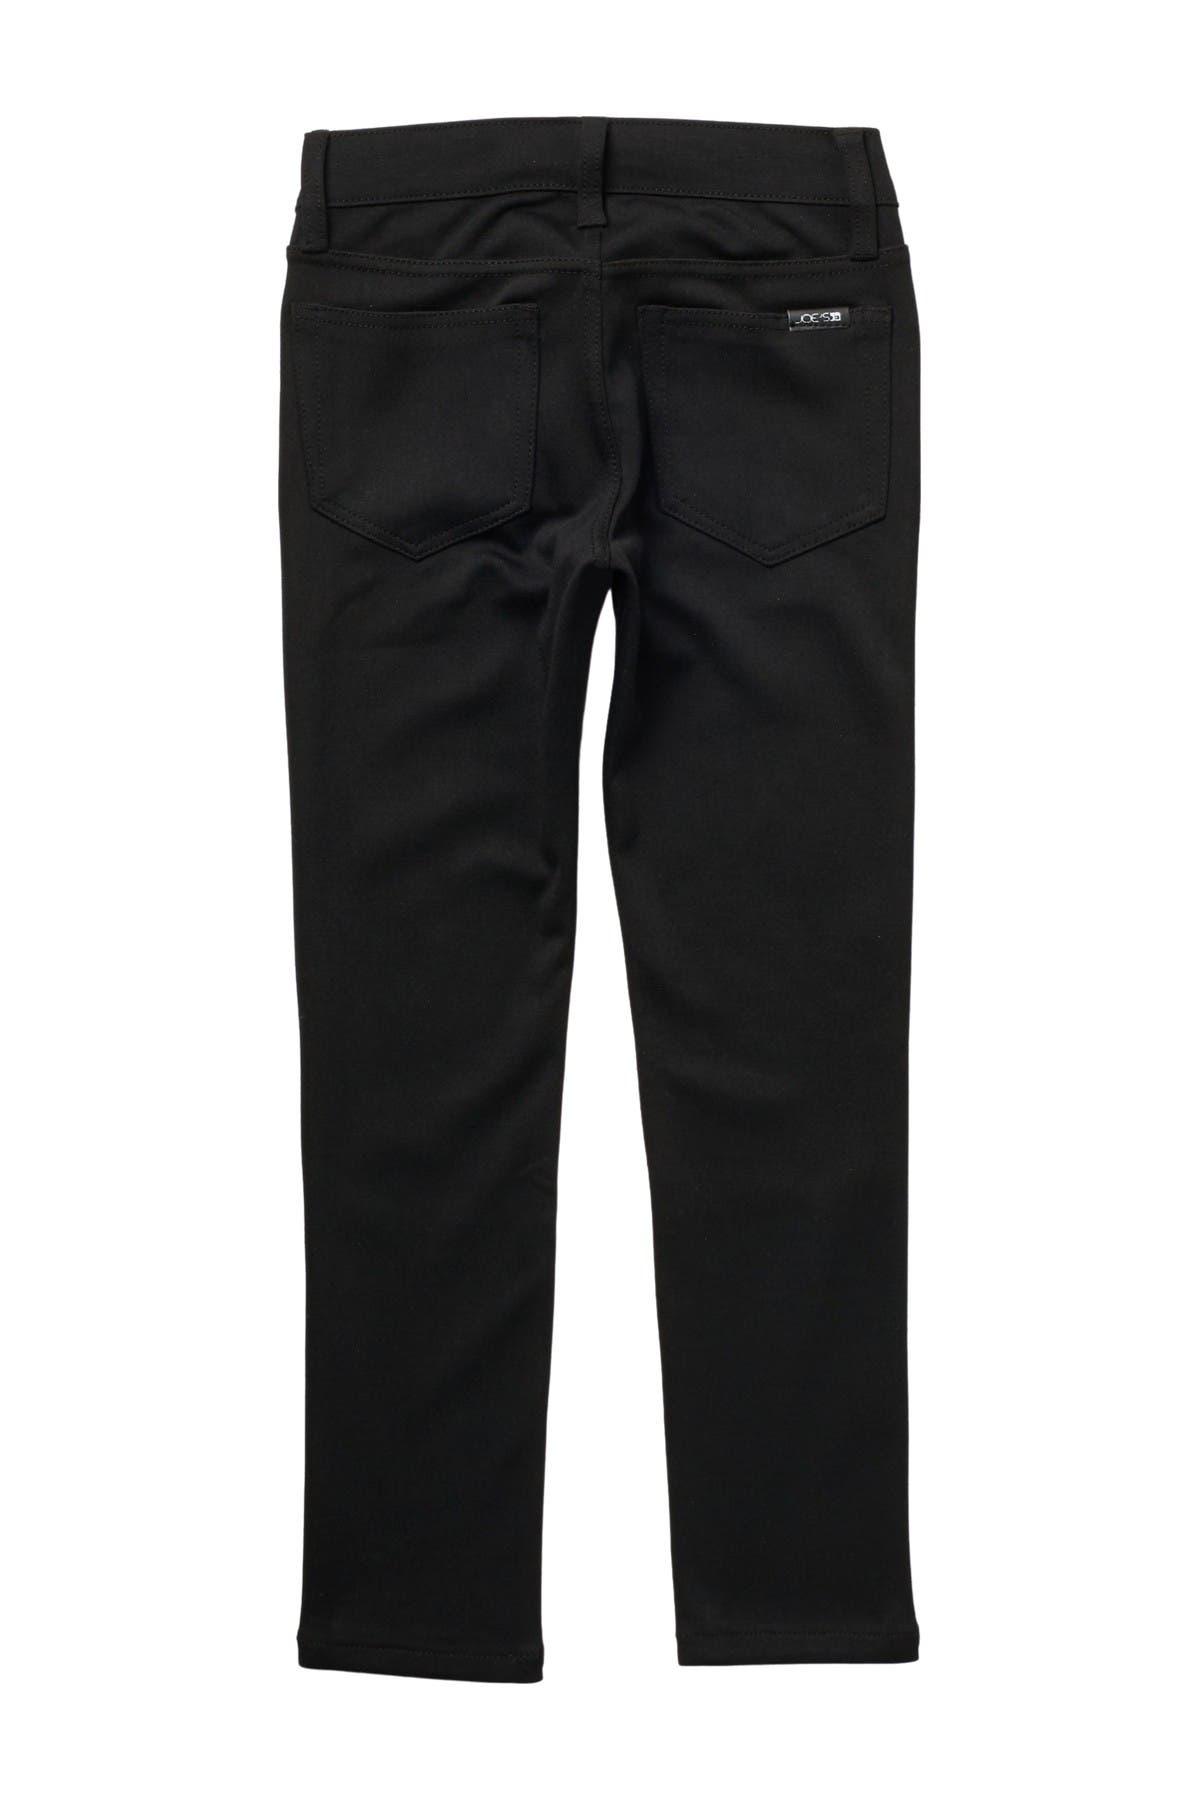 Joe's Jeans Mid Rise Ponte Jeans